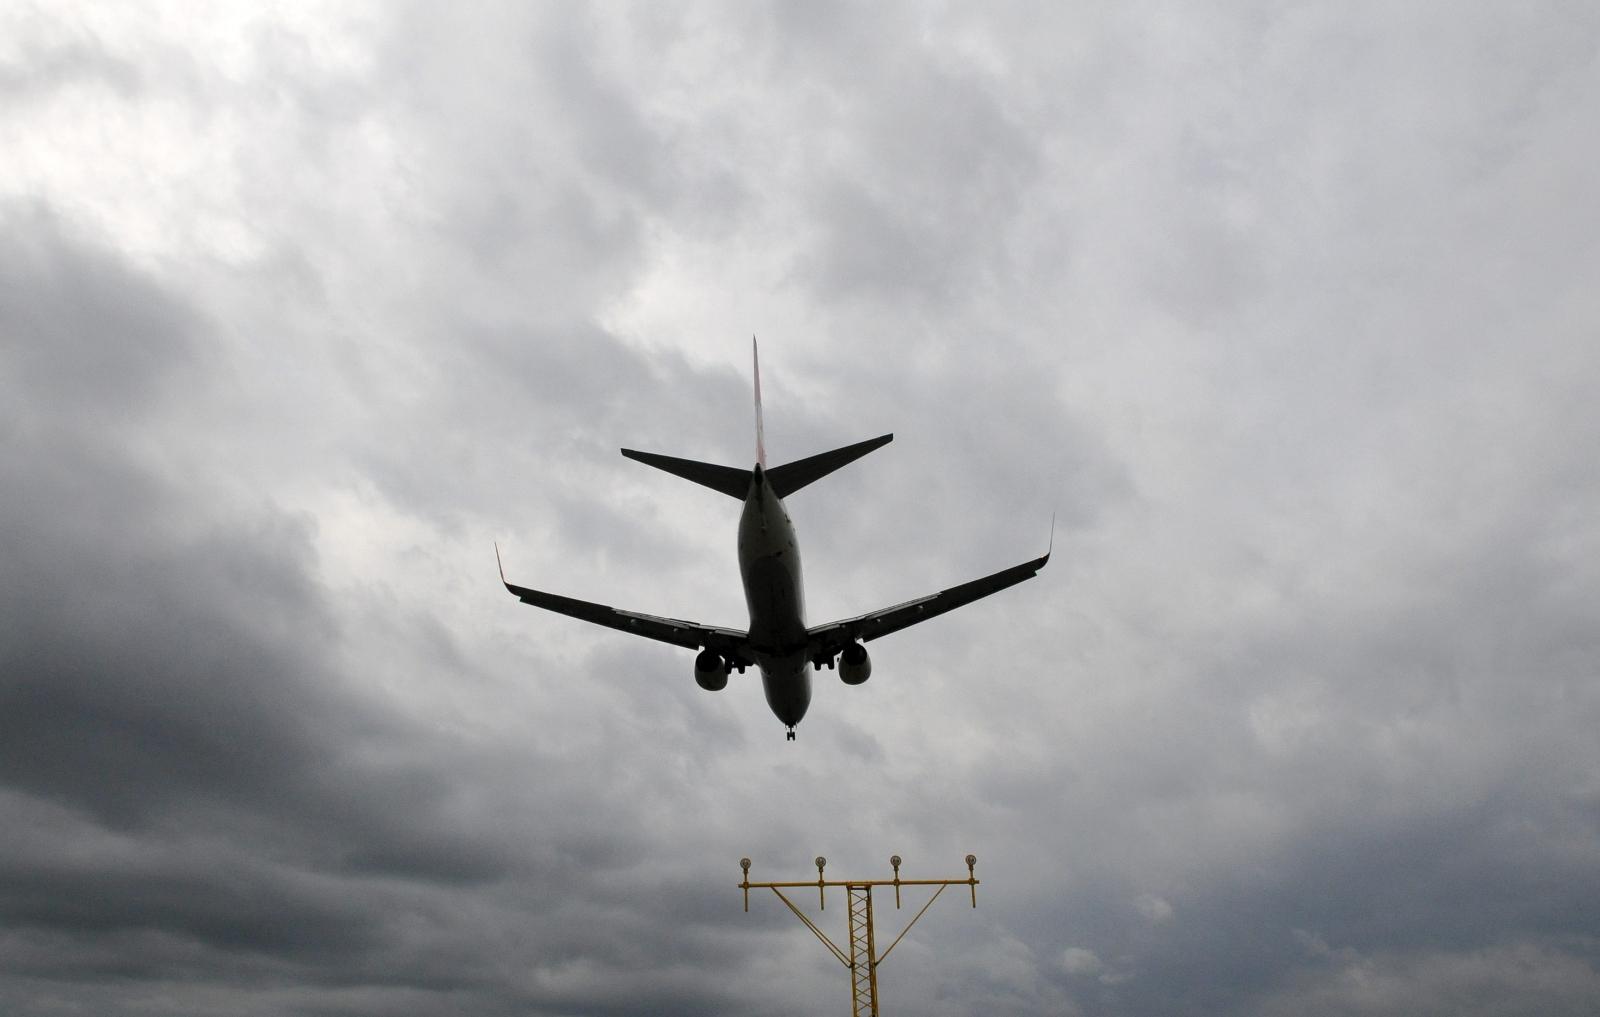 A plane lands at Stockholm's Arlanda Airport